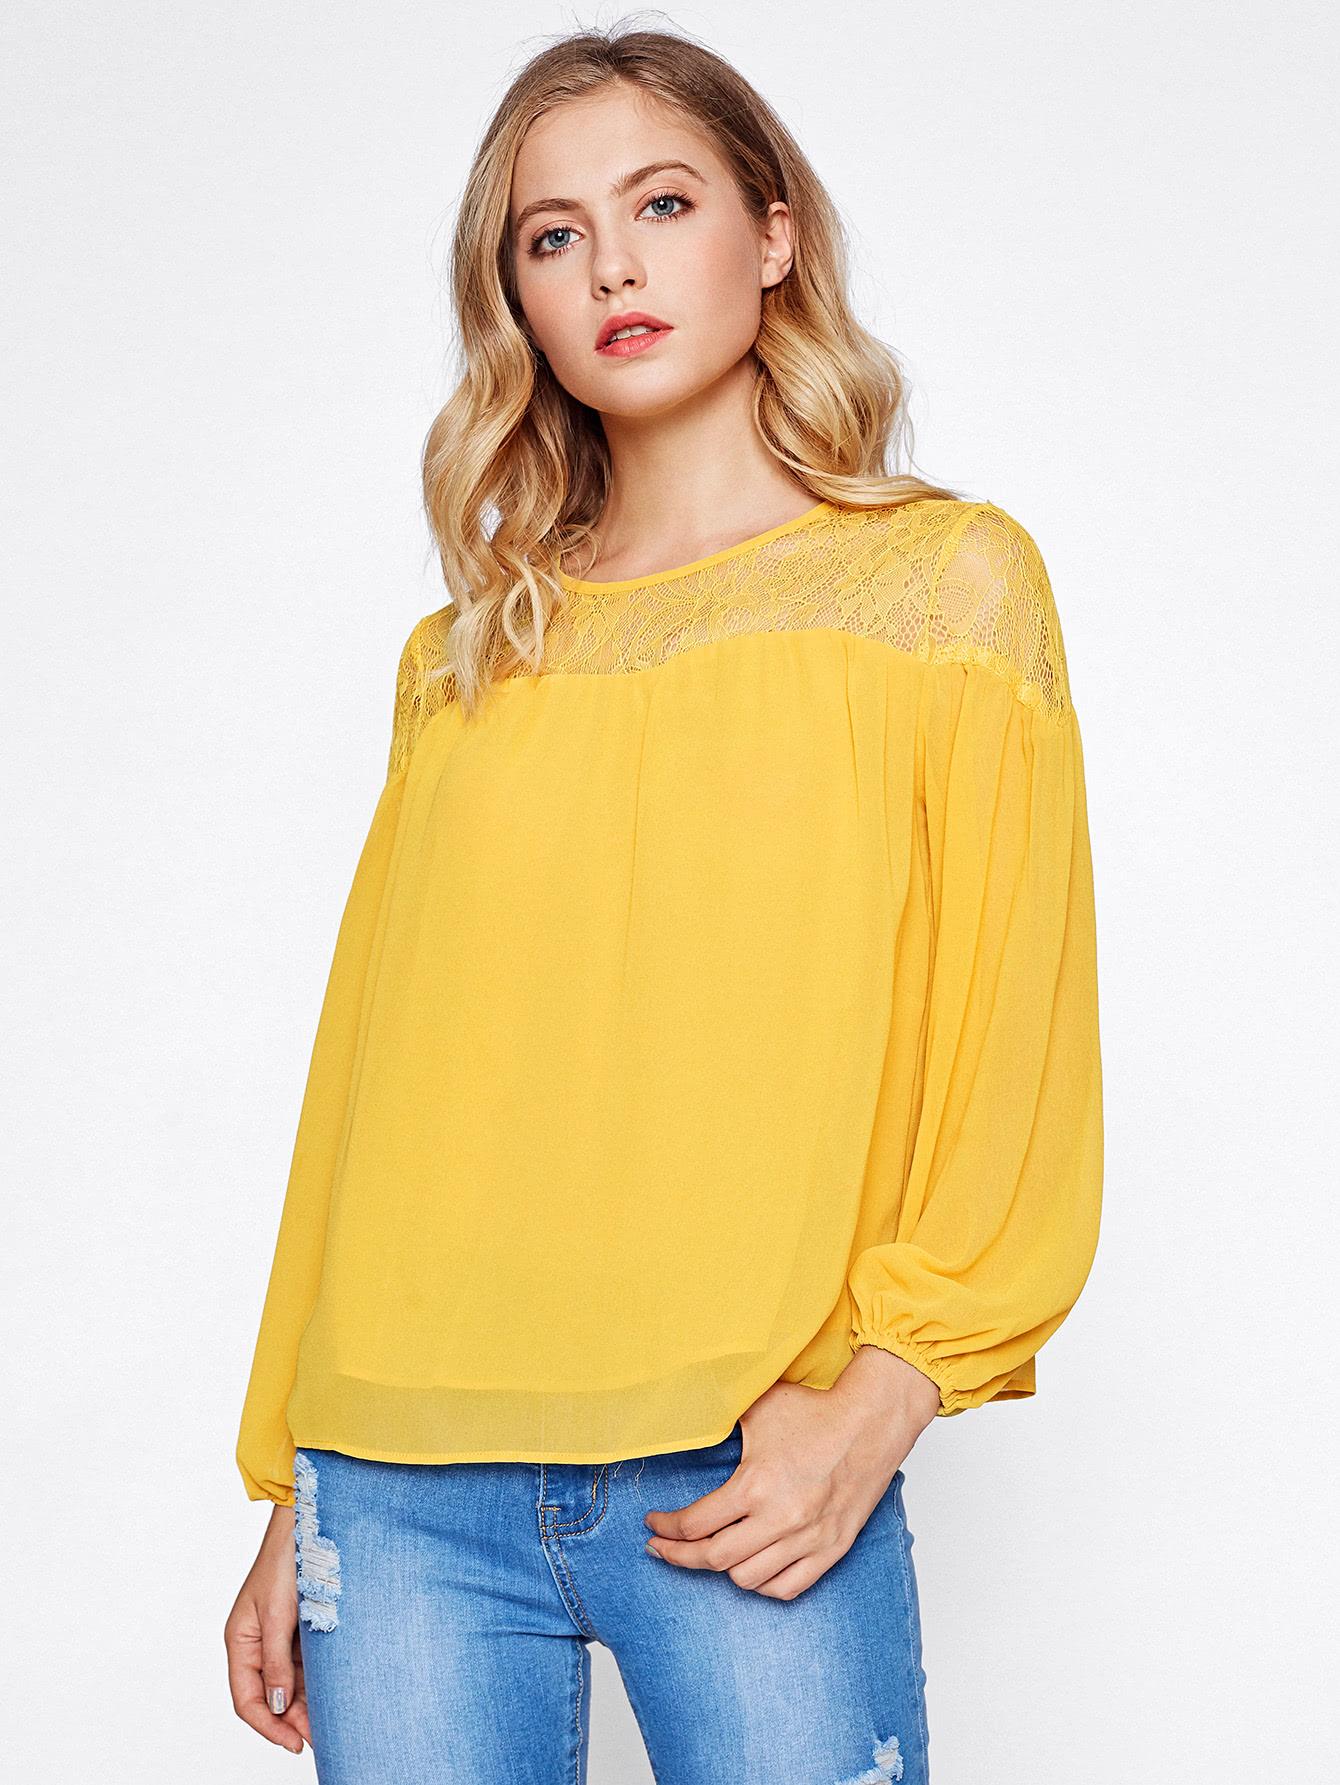 Lace Shoulder Buttoned Keyhole Lantern Sleeve Top blouse170704705